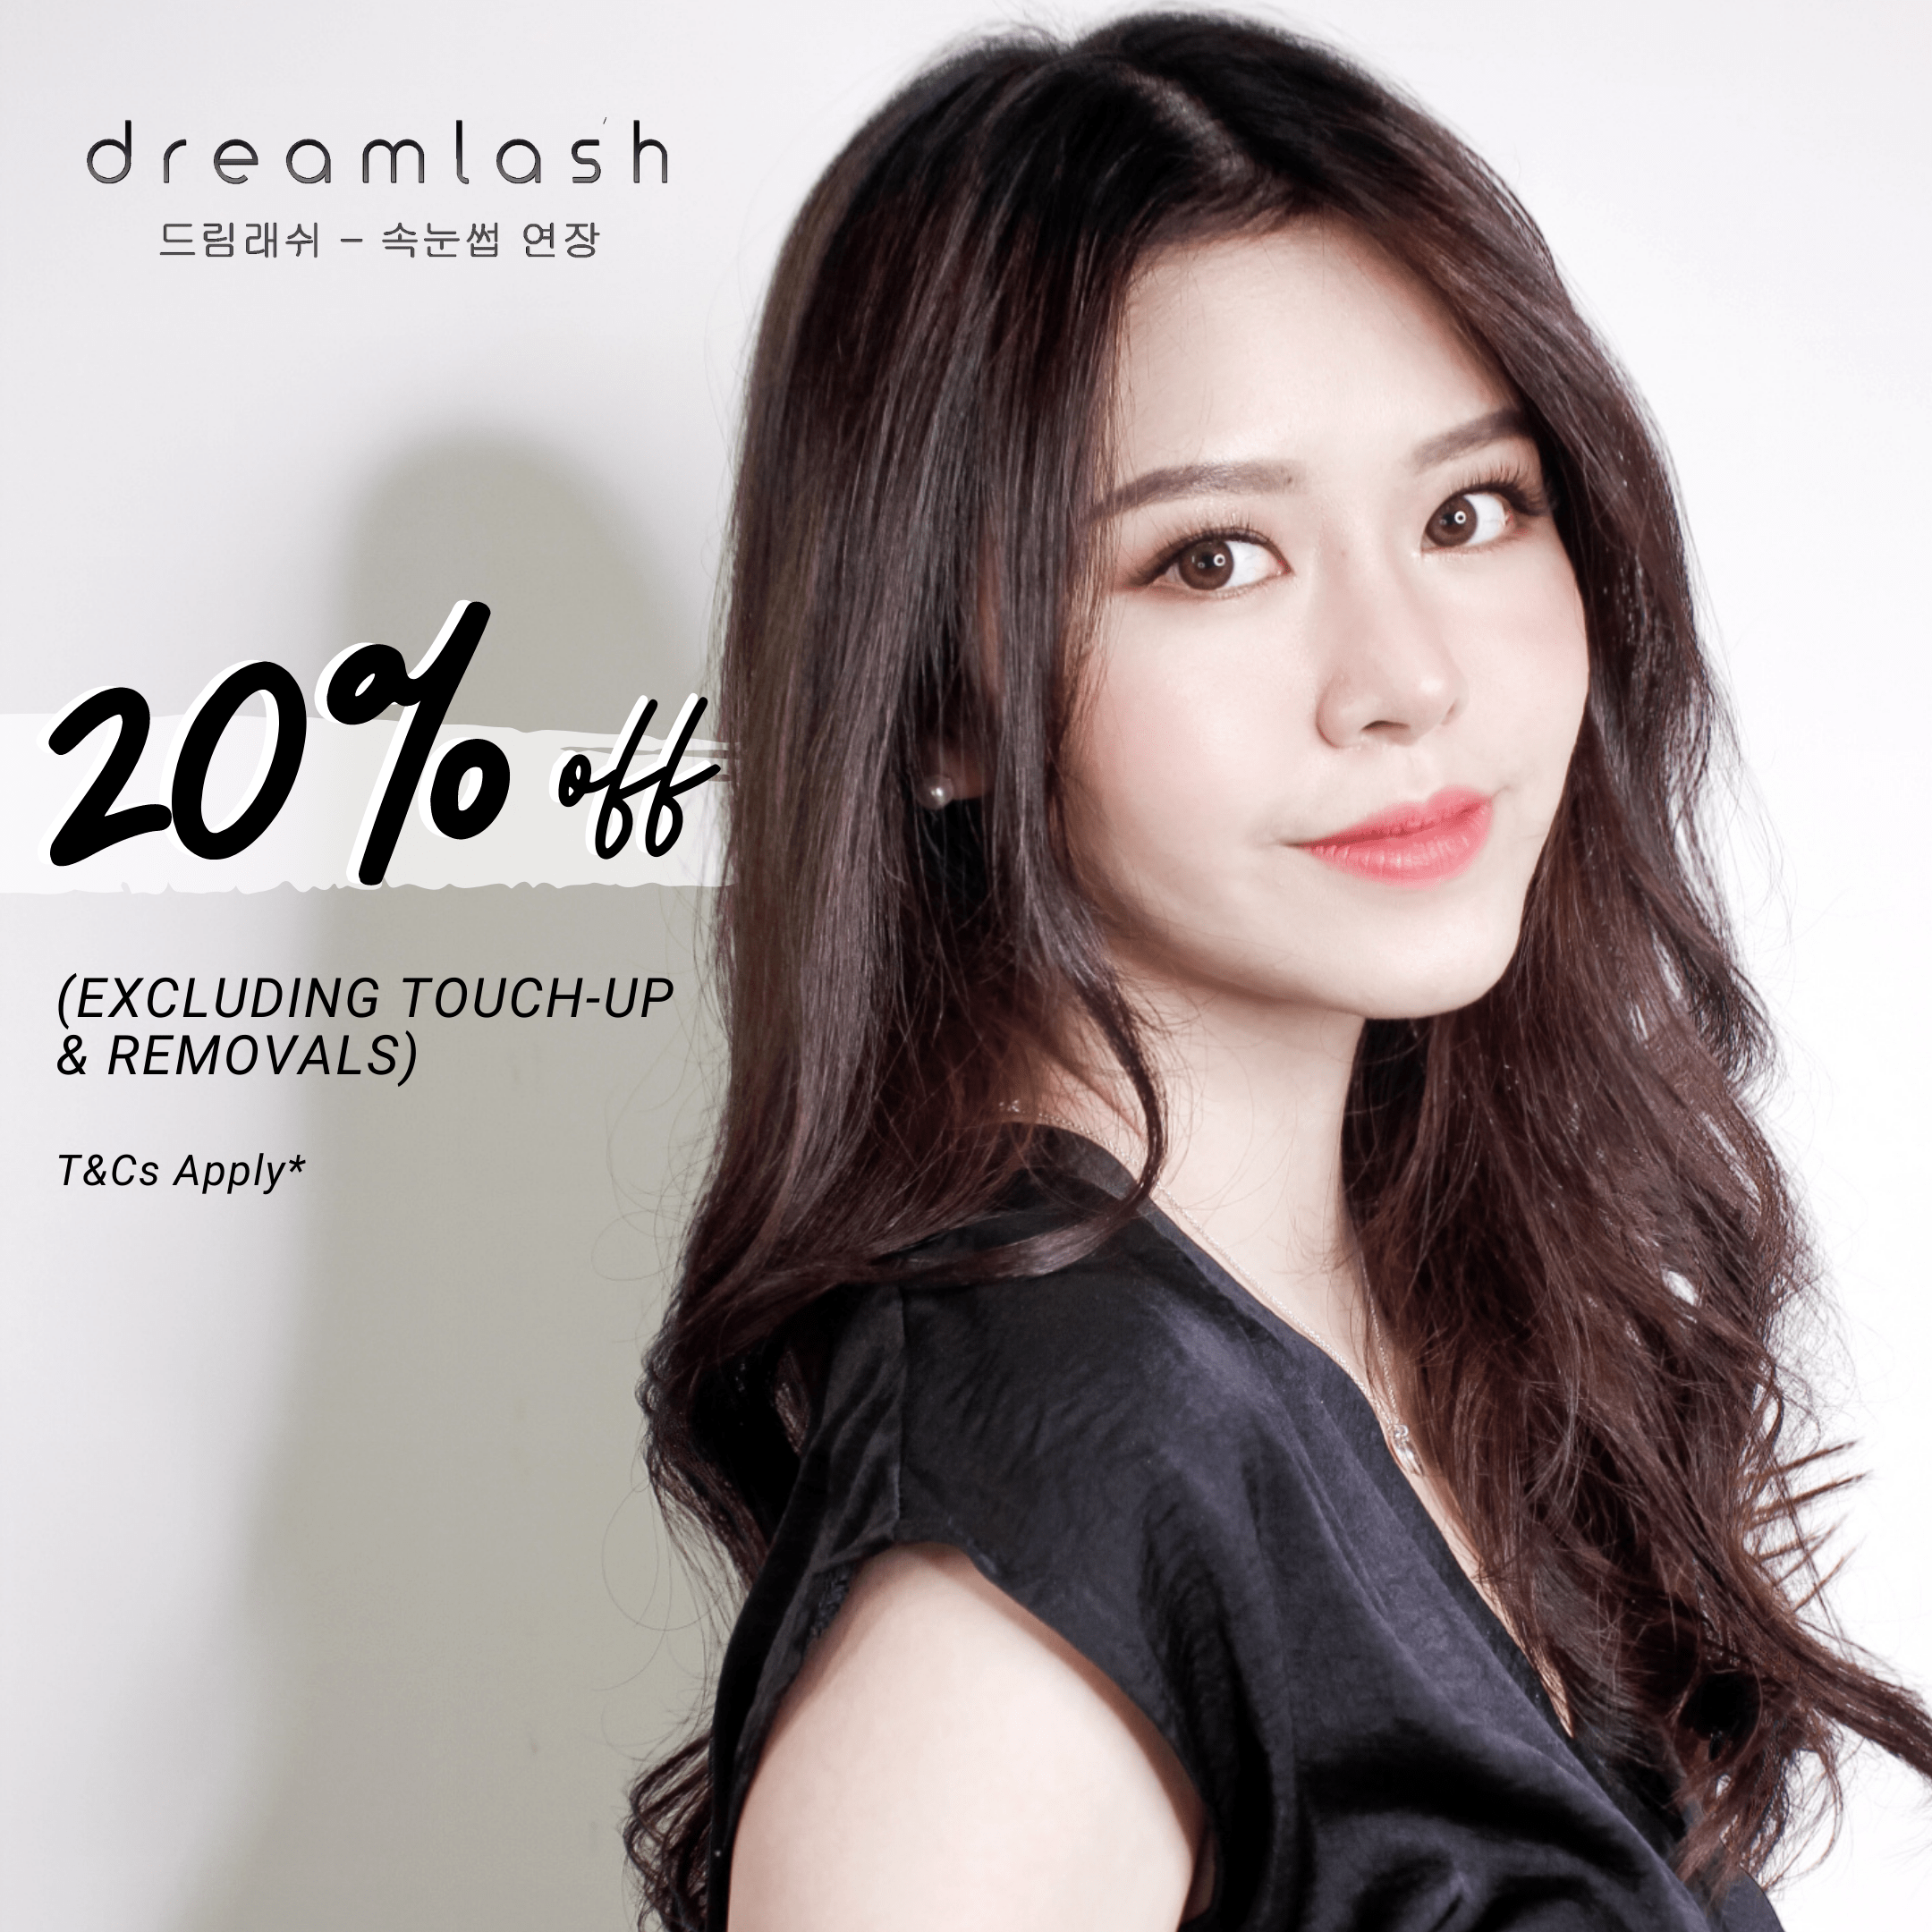 Promotion eyelash extensions | Dreamlash Korea